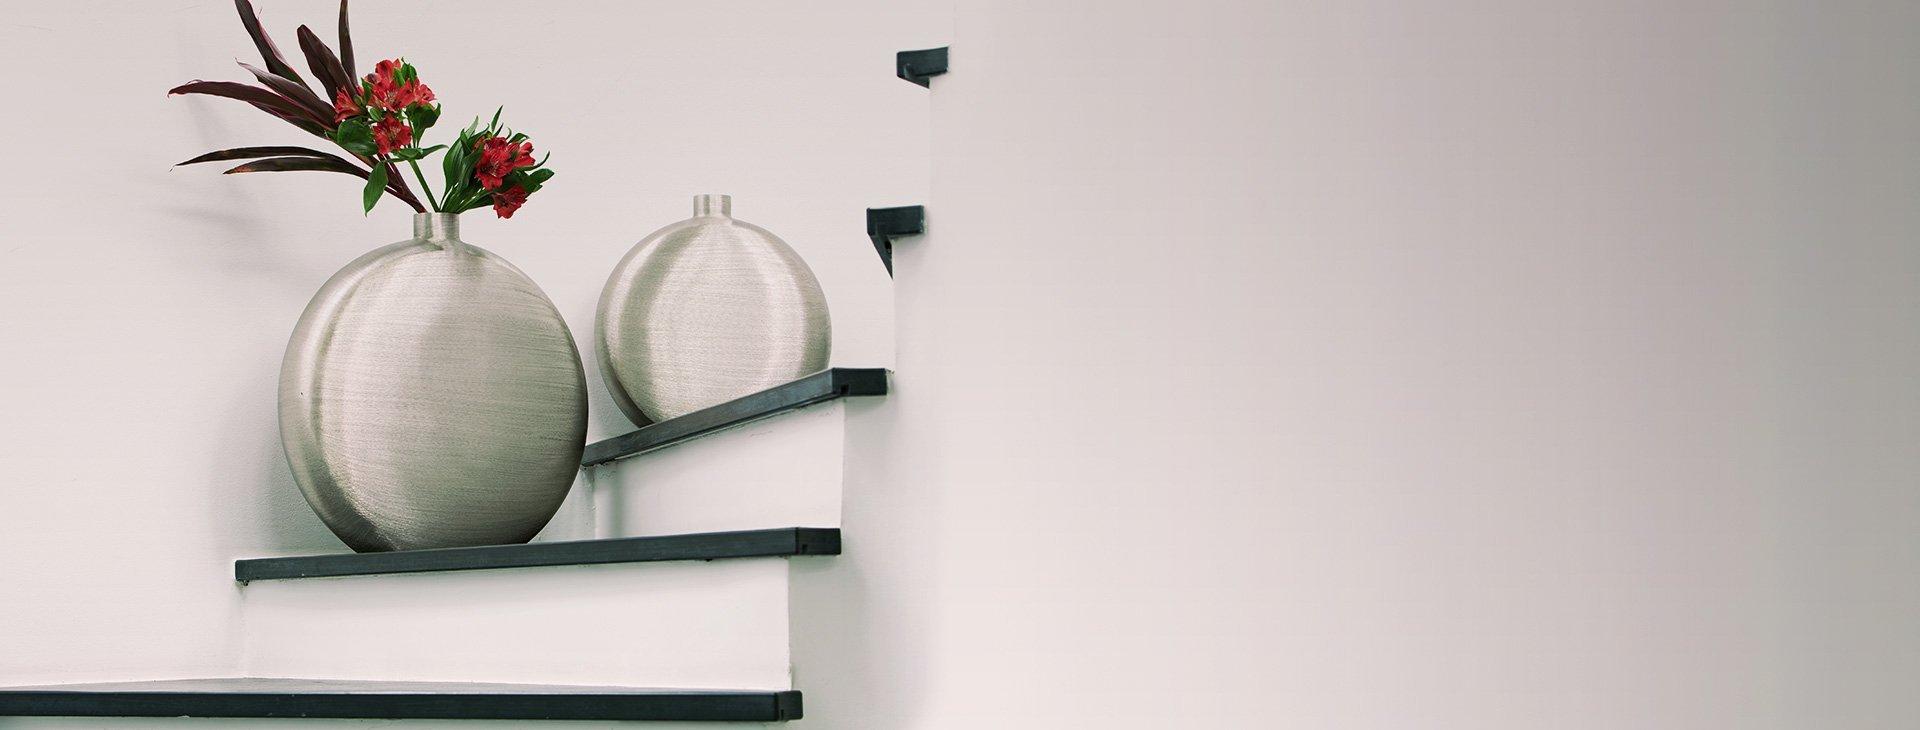 50 jahre lambert stilwerk news. Black Bedroom Furniture Sets. Home Design Ideas